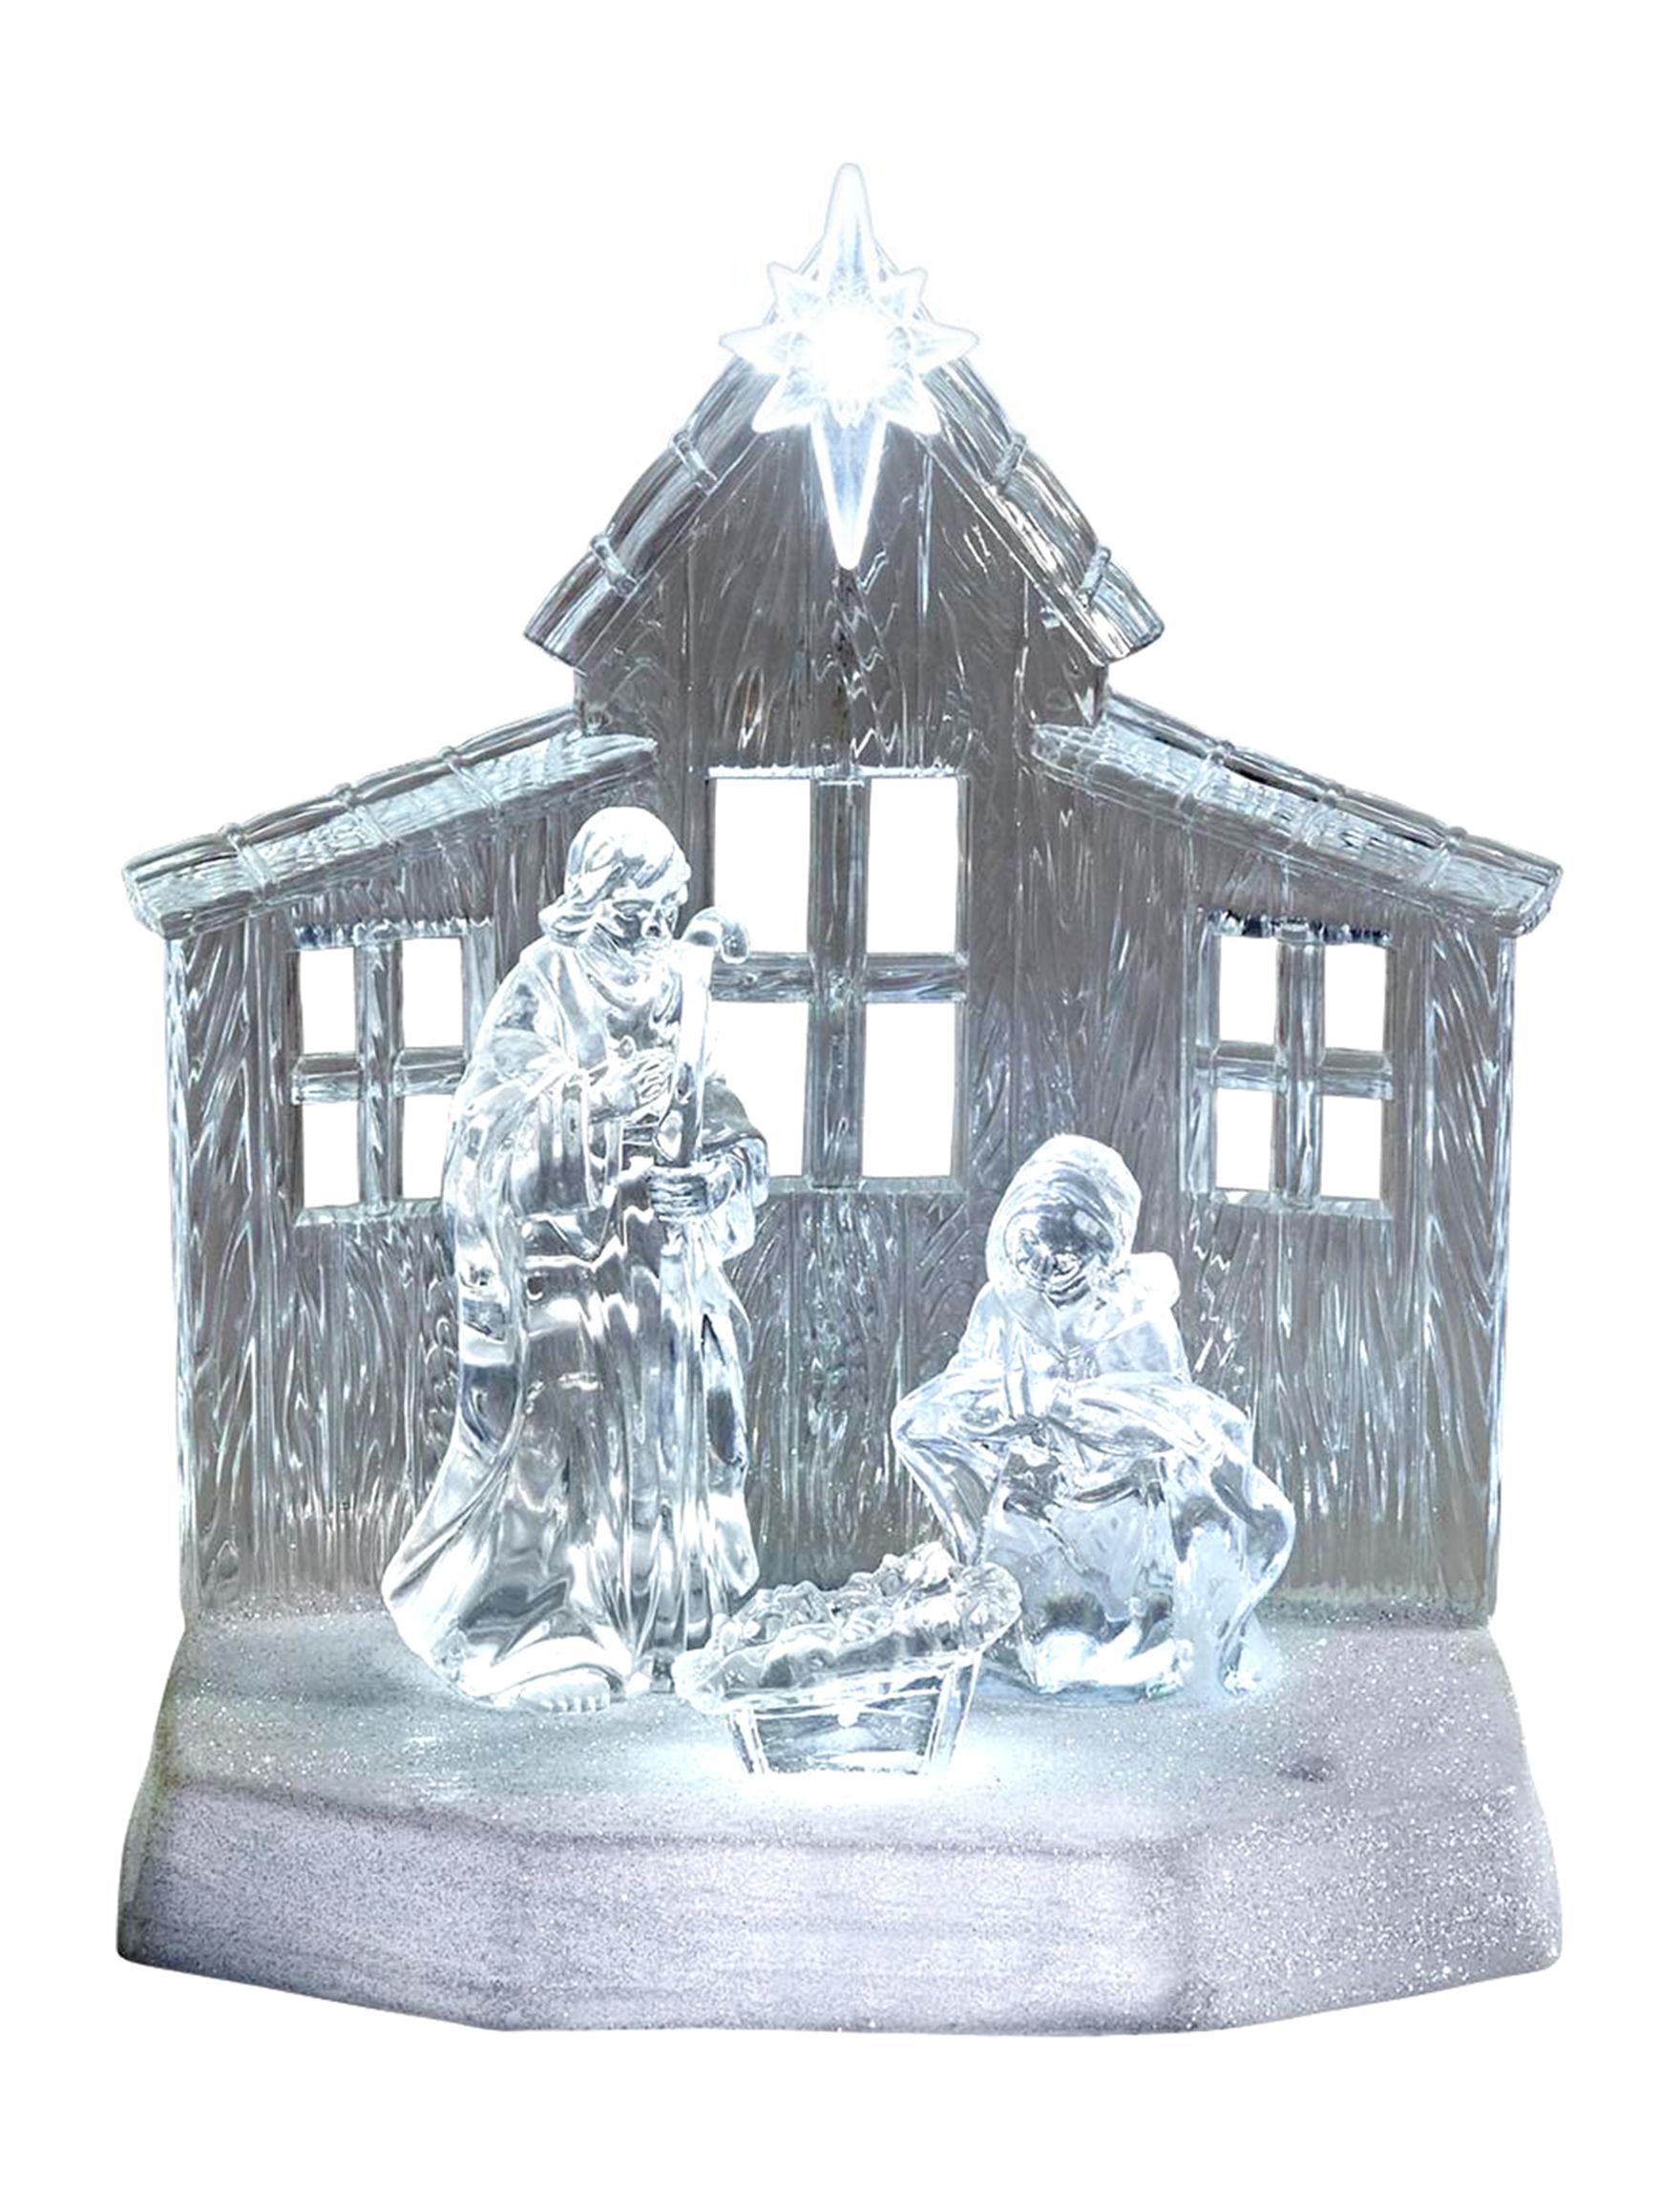 Apothecary White Lights & Lanterns Holiday Decor